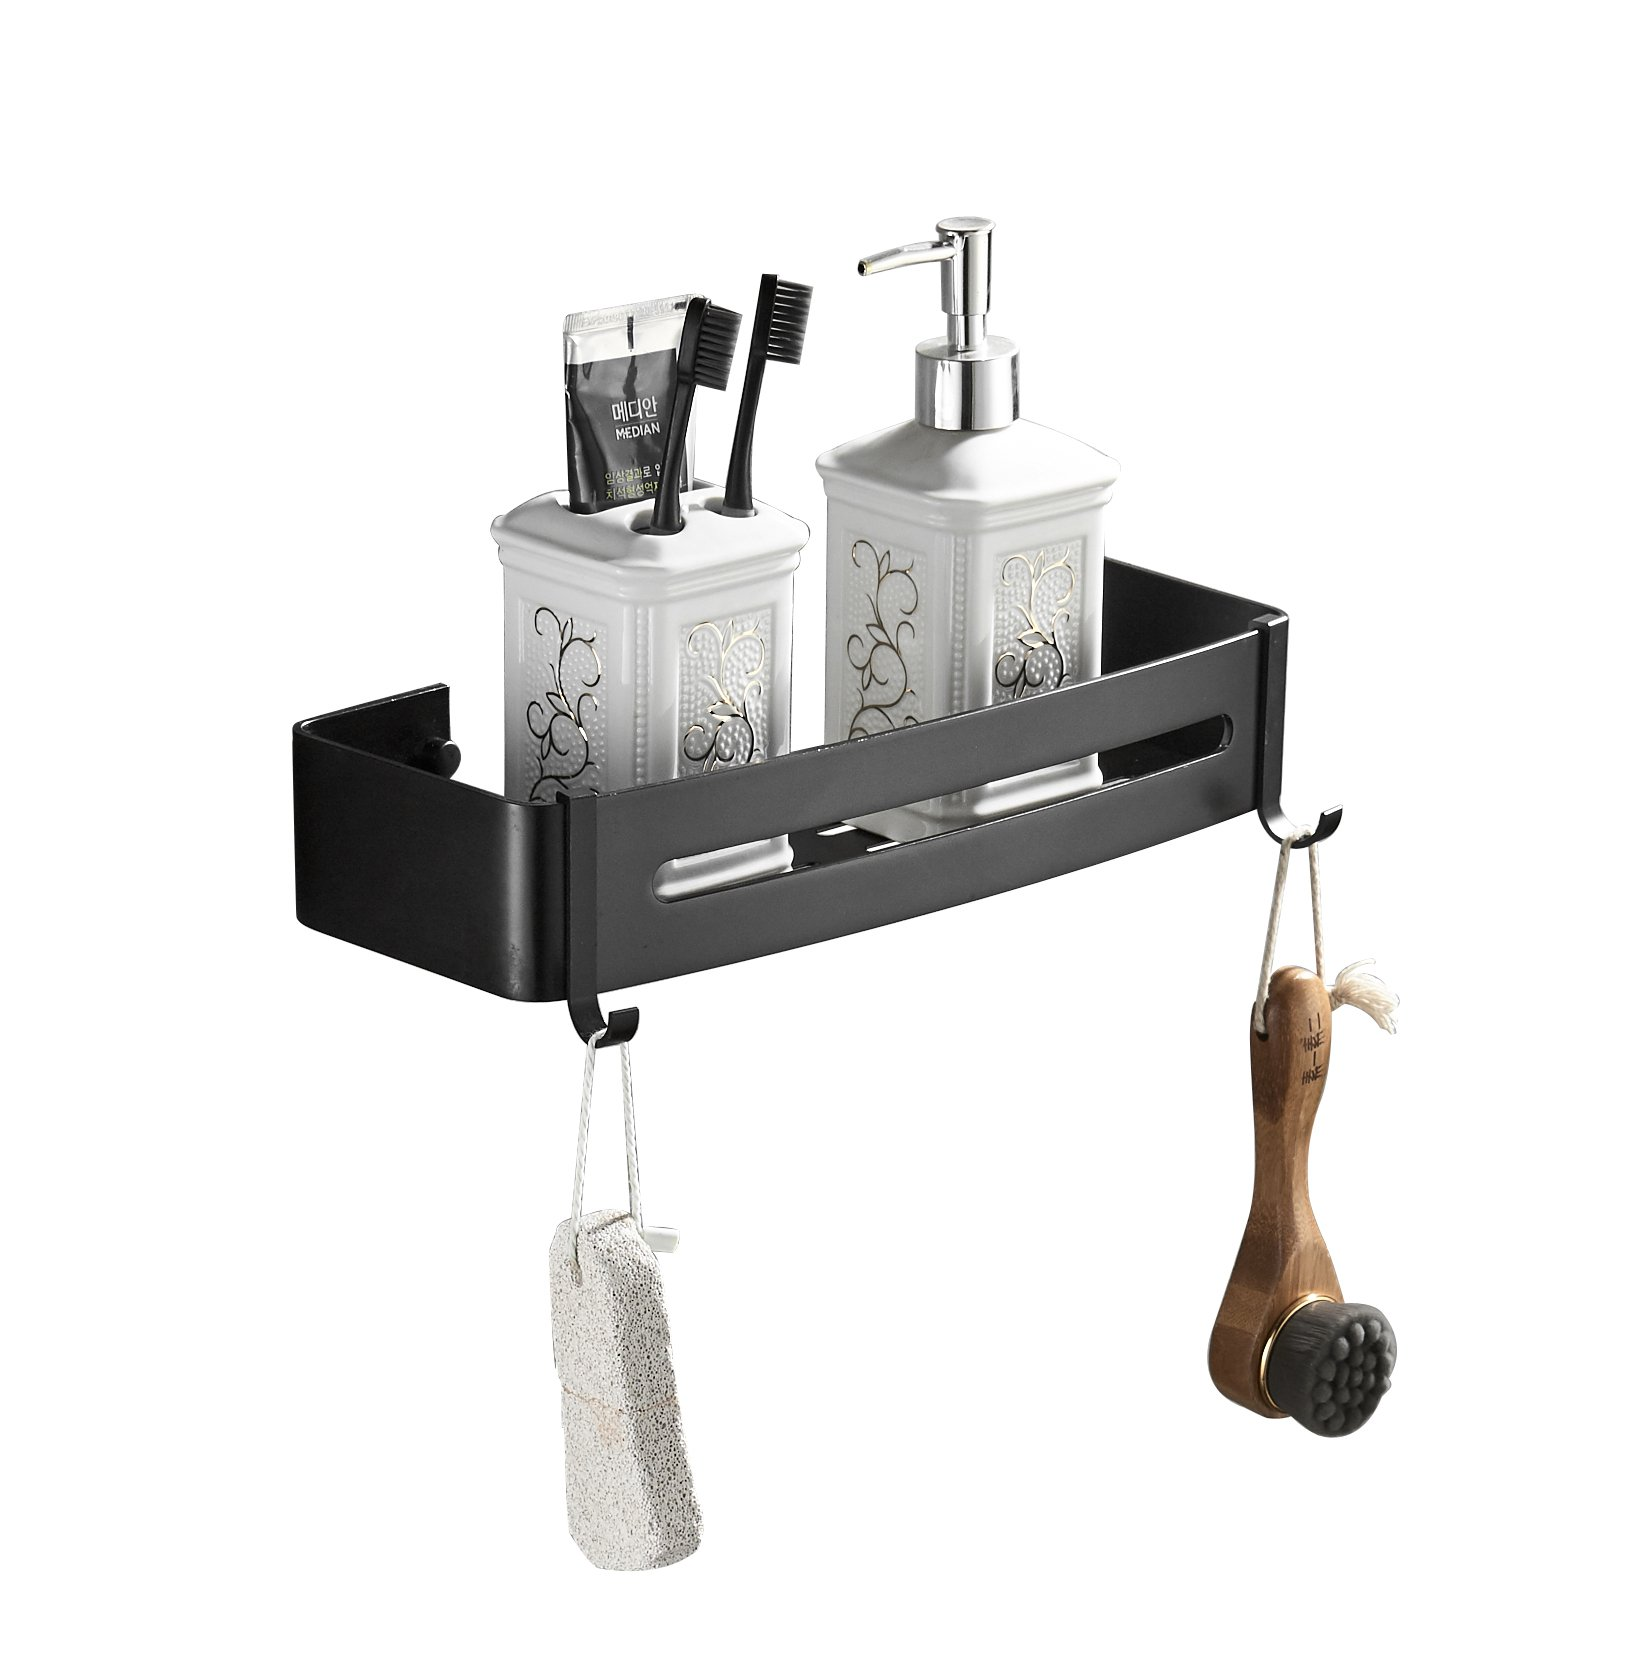 XOGOLO Black Bathroom Shower Shelf Rectangular Wall Shower Caddy Space Aluminum 6062-3